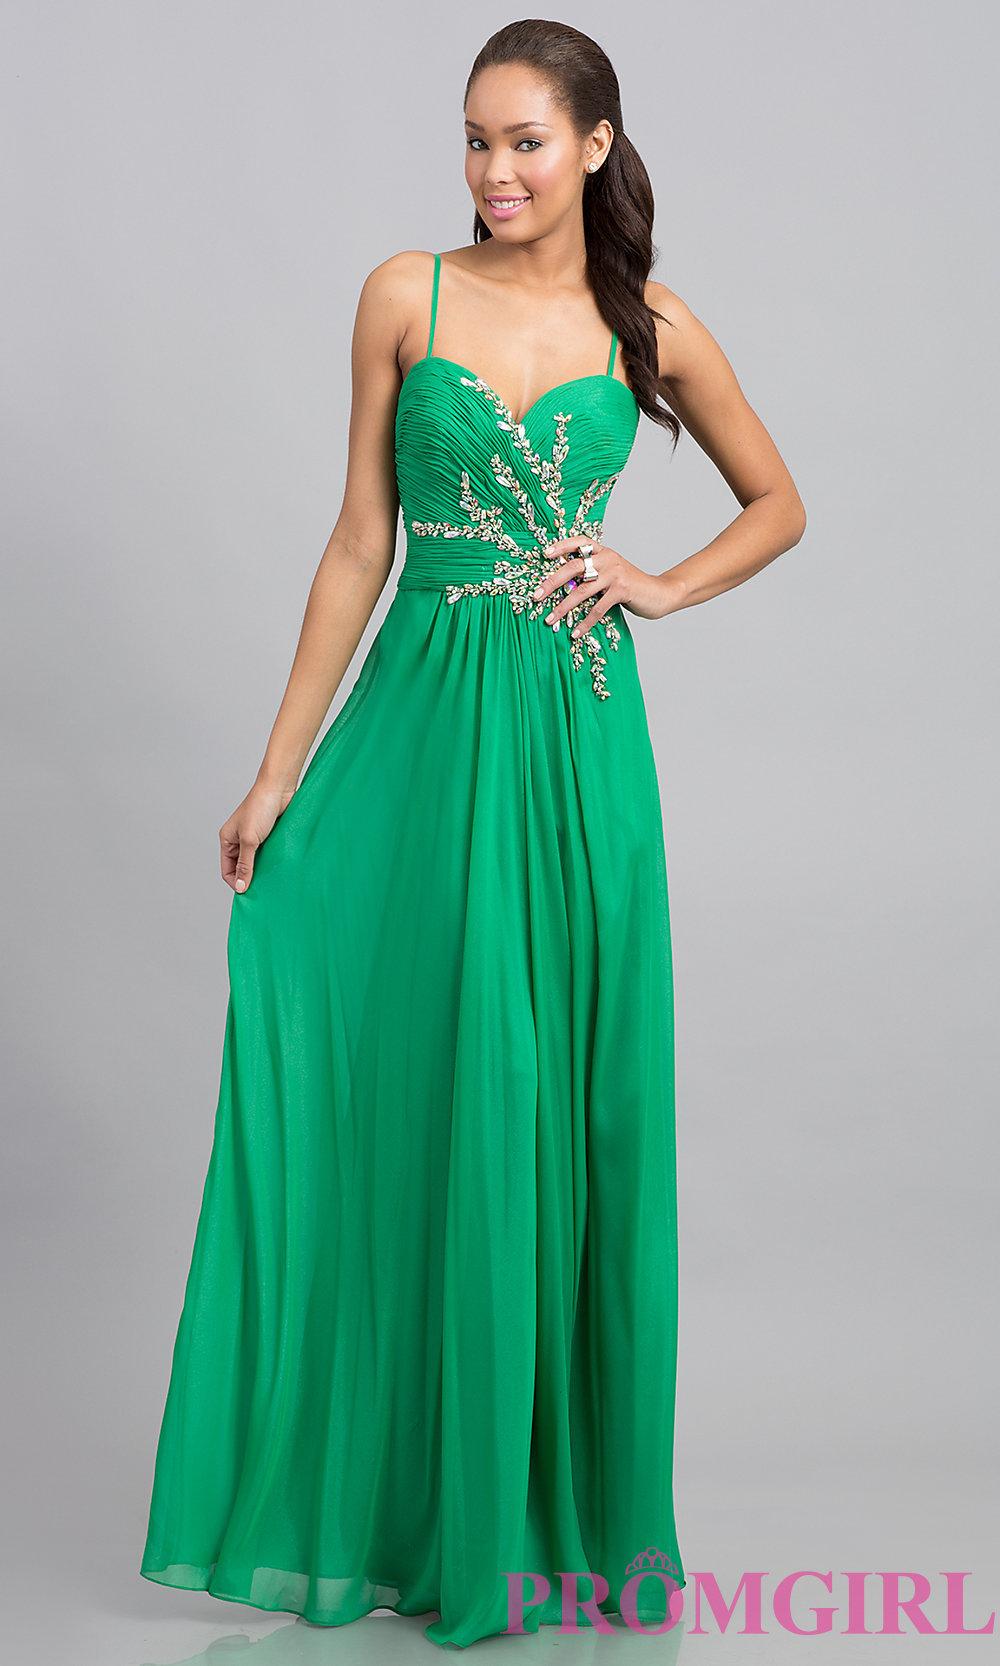 httpwwwdressesphotoscomimageprom dress stores in charlotte nc6 1000x1666